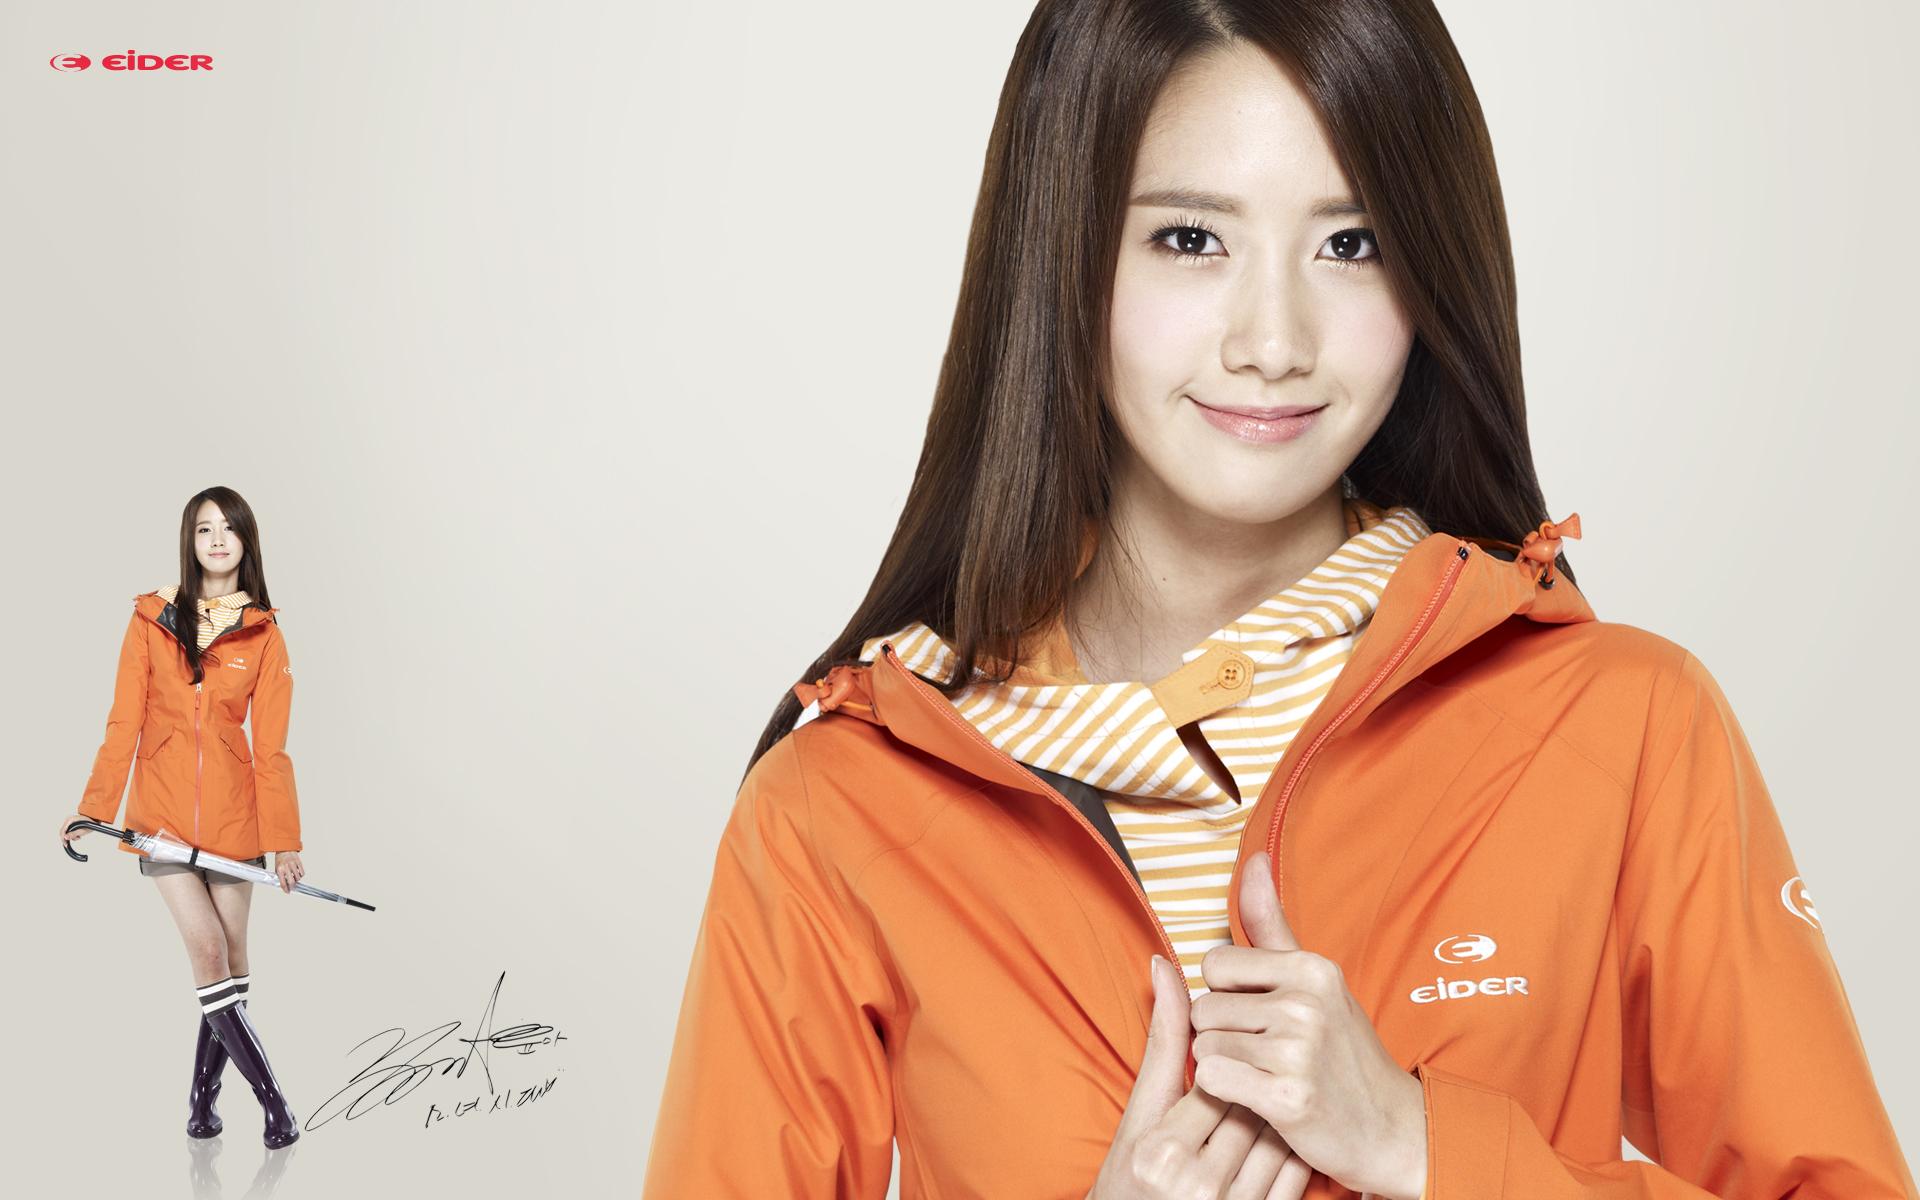 Yoona - Eider Website Wallpape